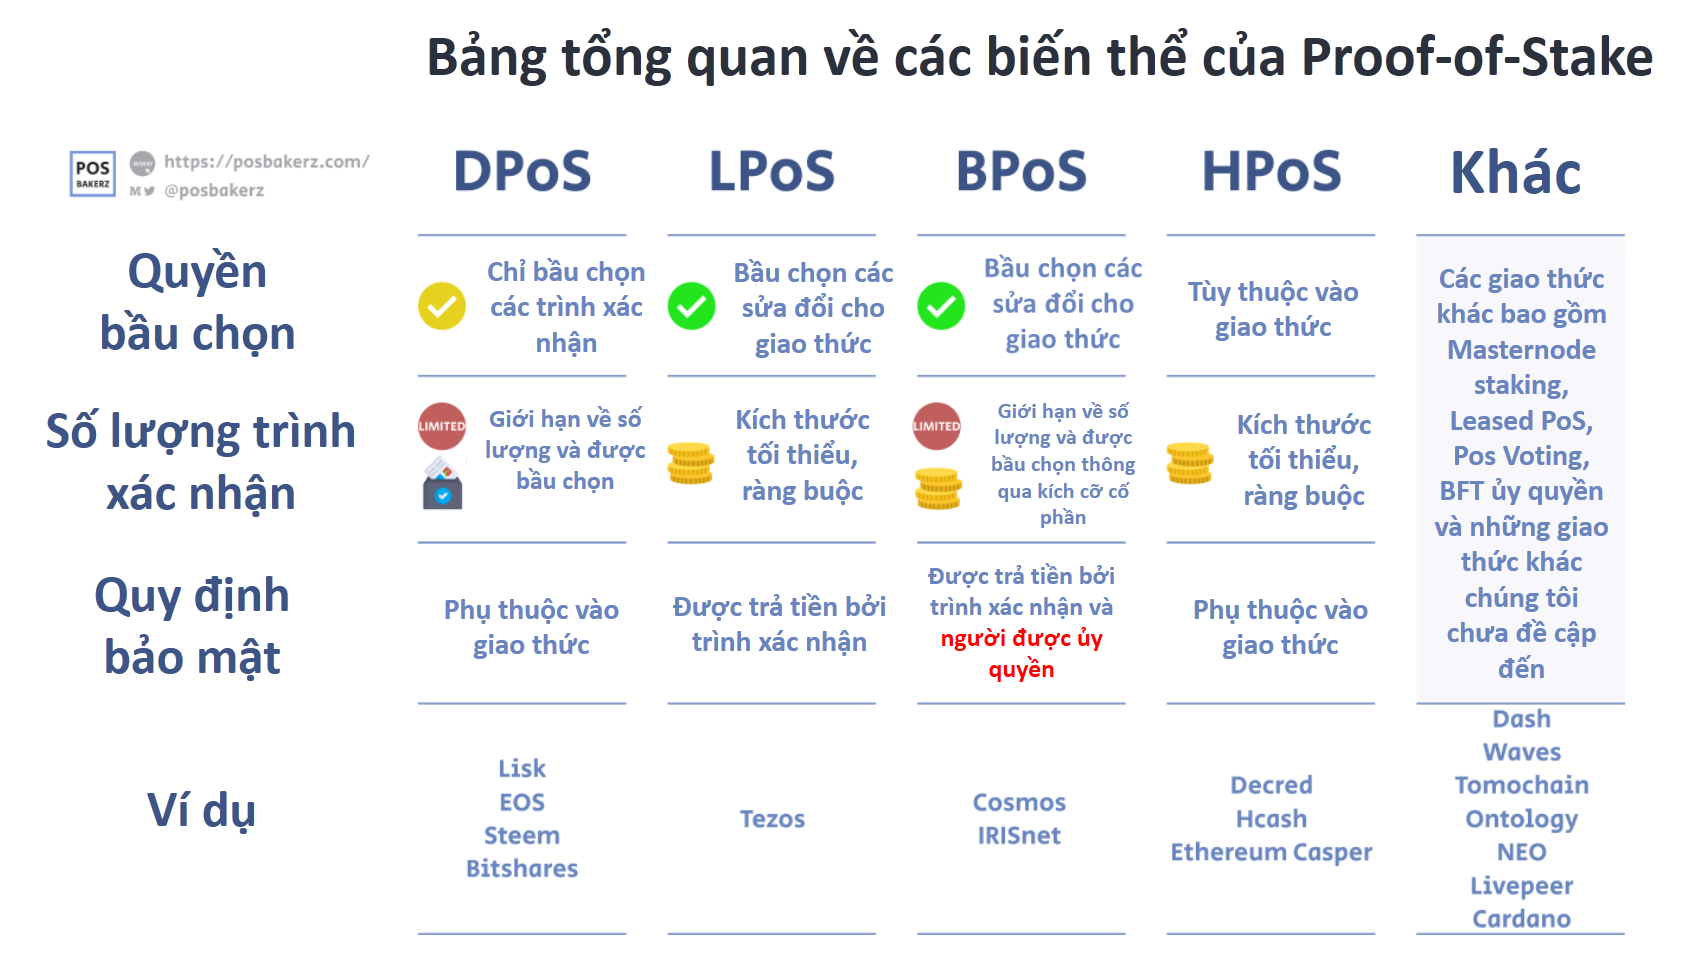 gioi-thieu-va-huong-dan-ve-cac-bien-the-cua-proof-of-stake-dpos-lpos-bpos-hpos.